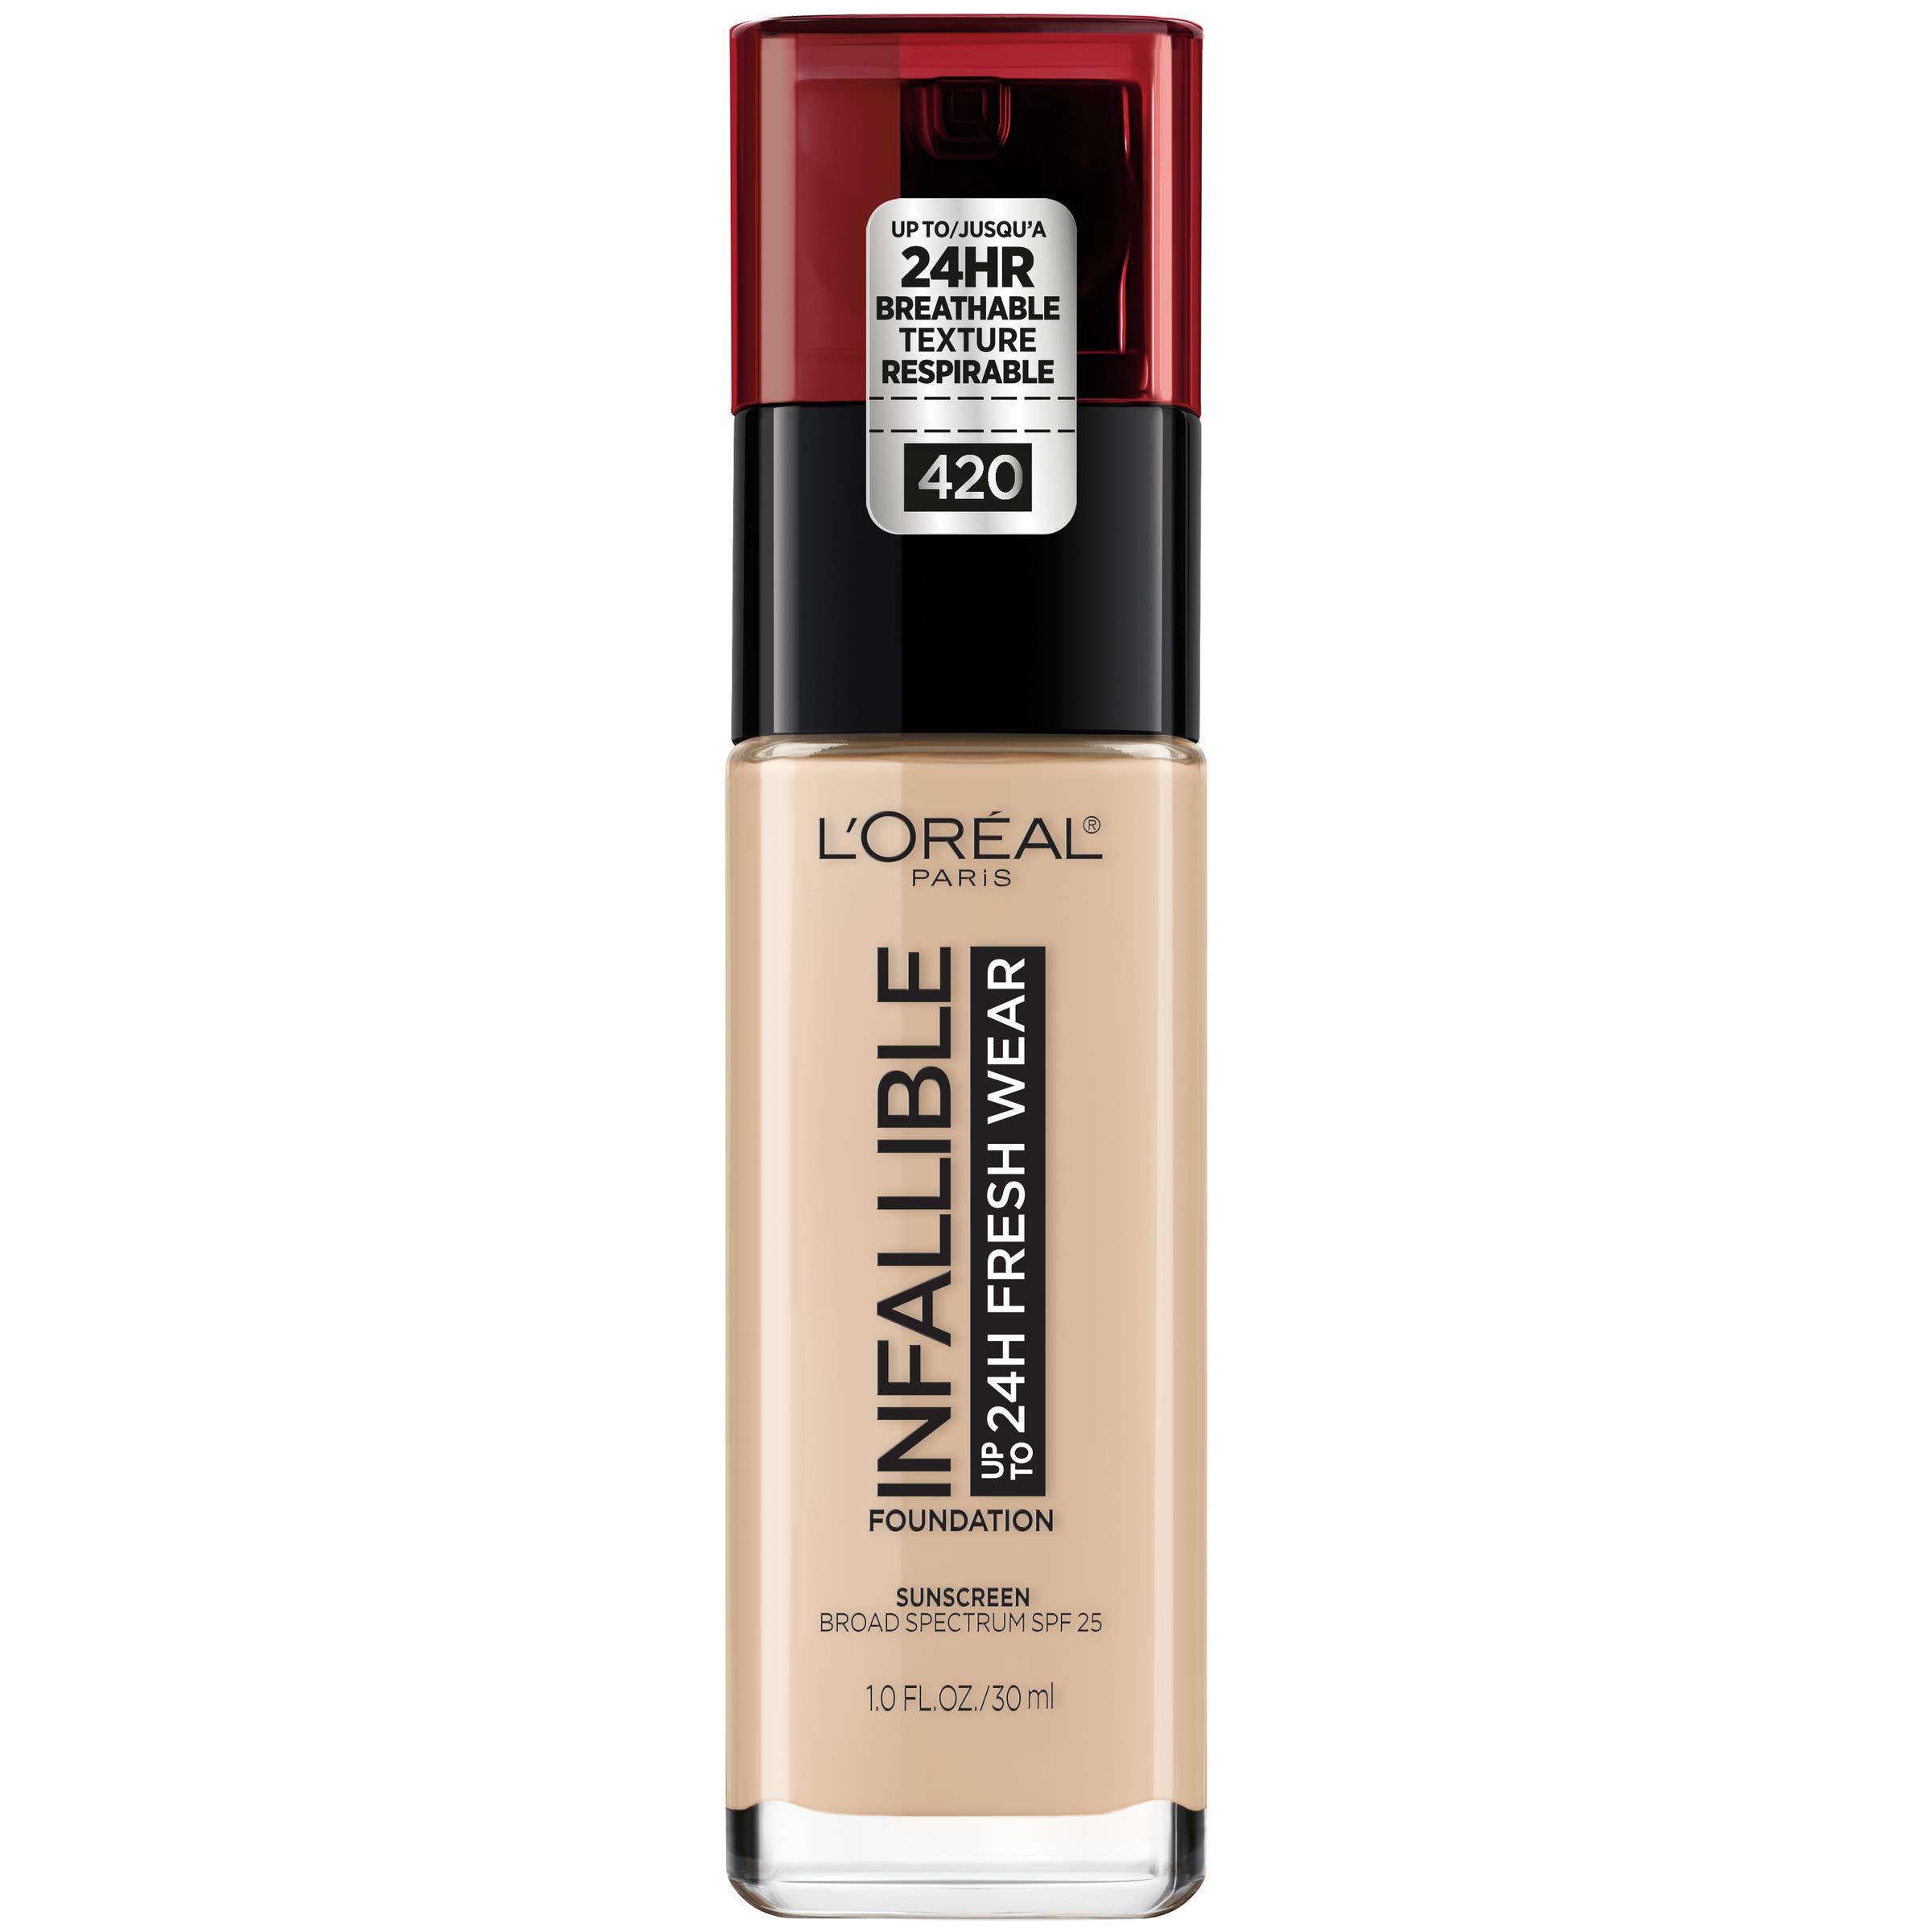 ede52b2d54a L'Oréal Paris Makeup Infallible up to 24HR Fresh Wear Liquid Longwear  Foundation, Lightweight, Breathable, Natural Matte Finish, Medium-Full  Coverage, ...